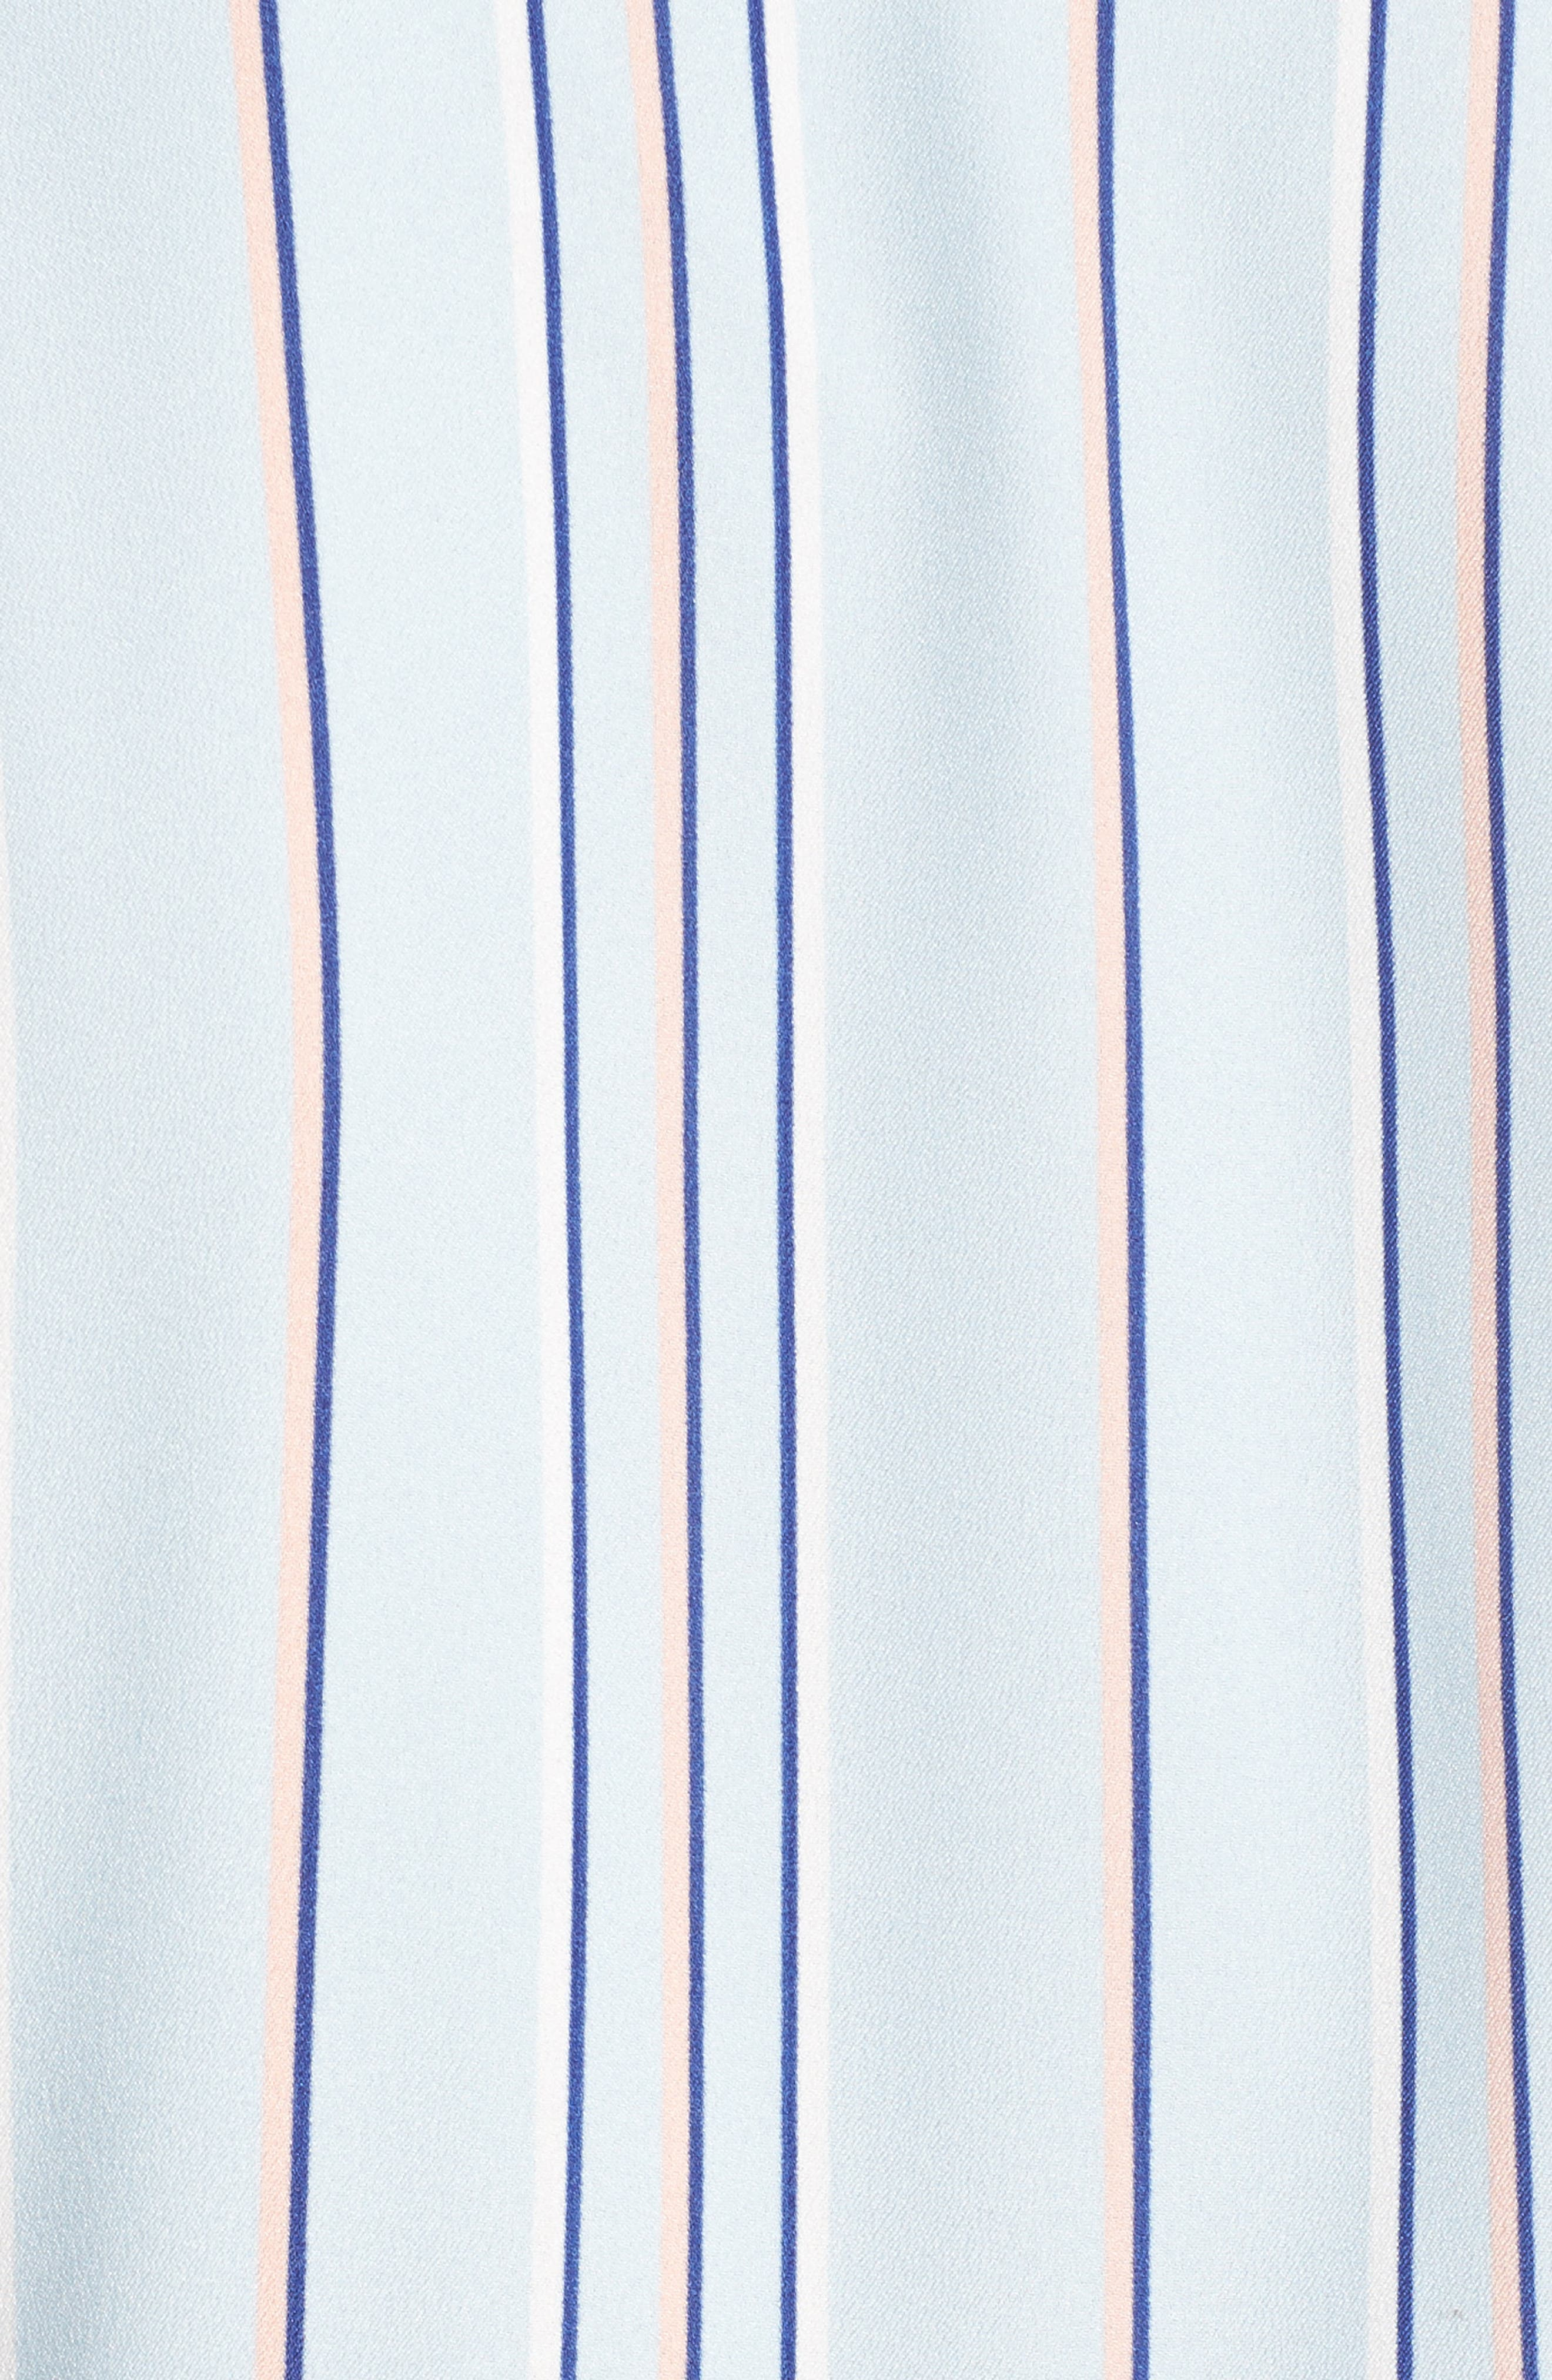 Stripe Shirtdress,                             Alternate thumbnail 5, color,                             Powder Blue Multi